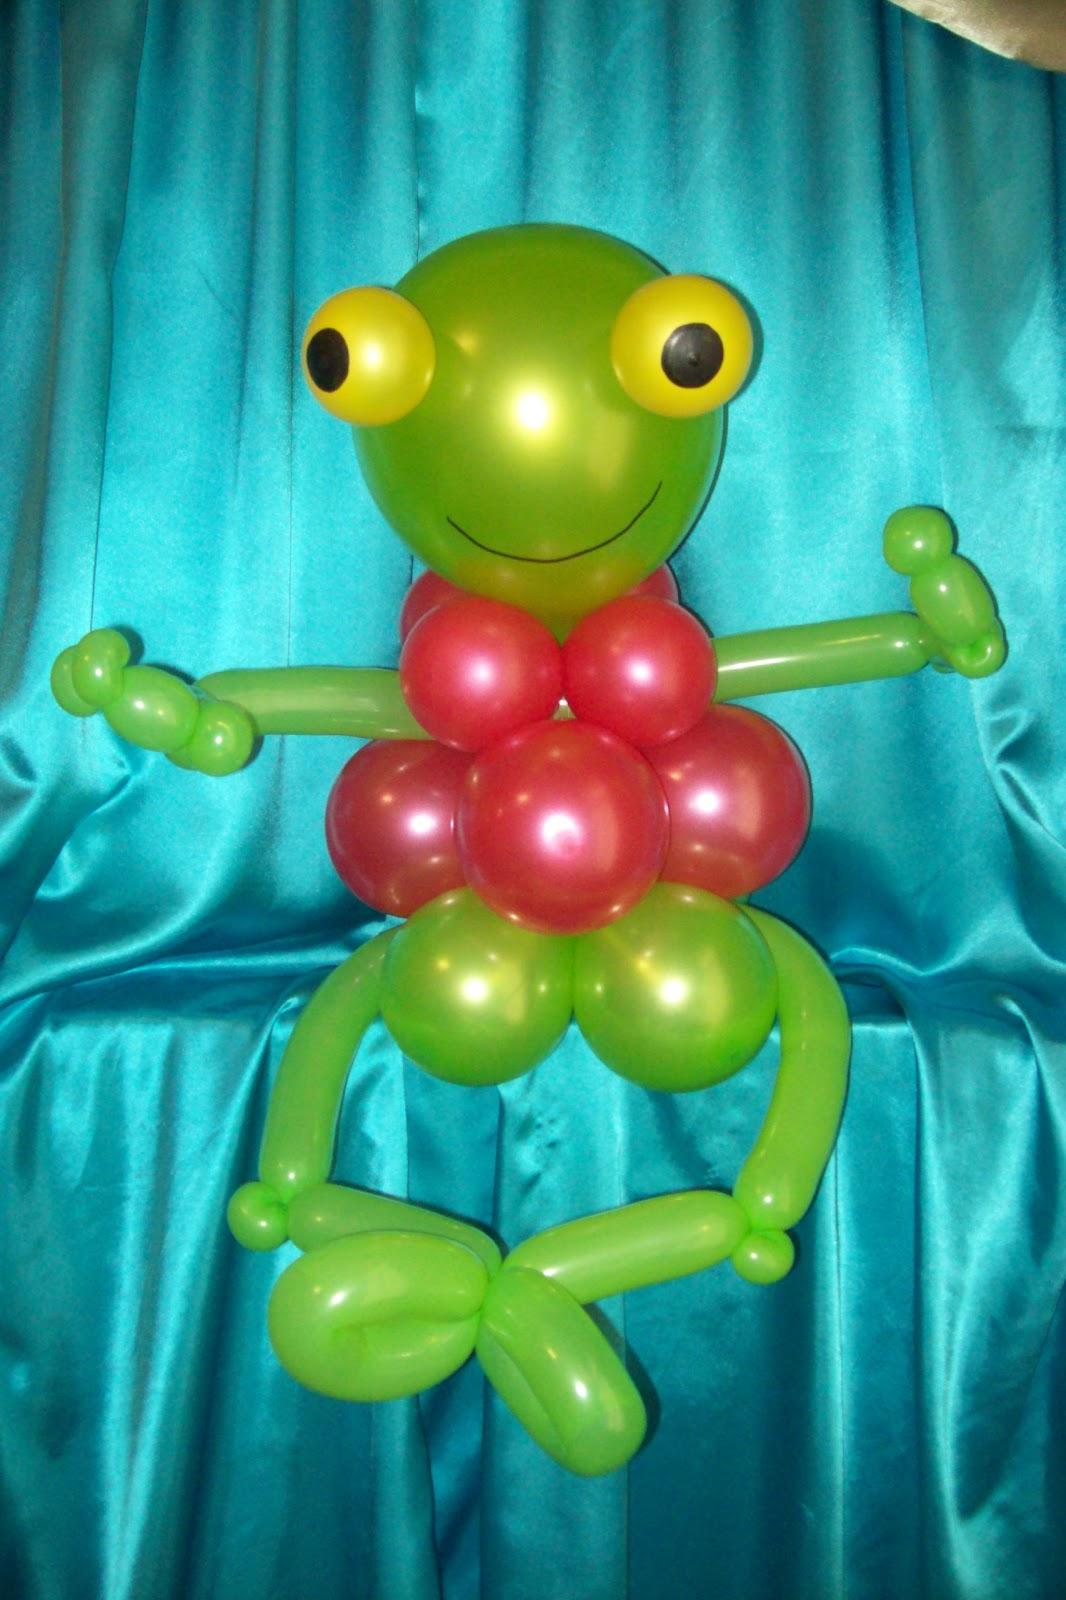 Decoracion con globos para fiestas infantiles decoracion - Adornos de globos ...